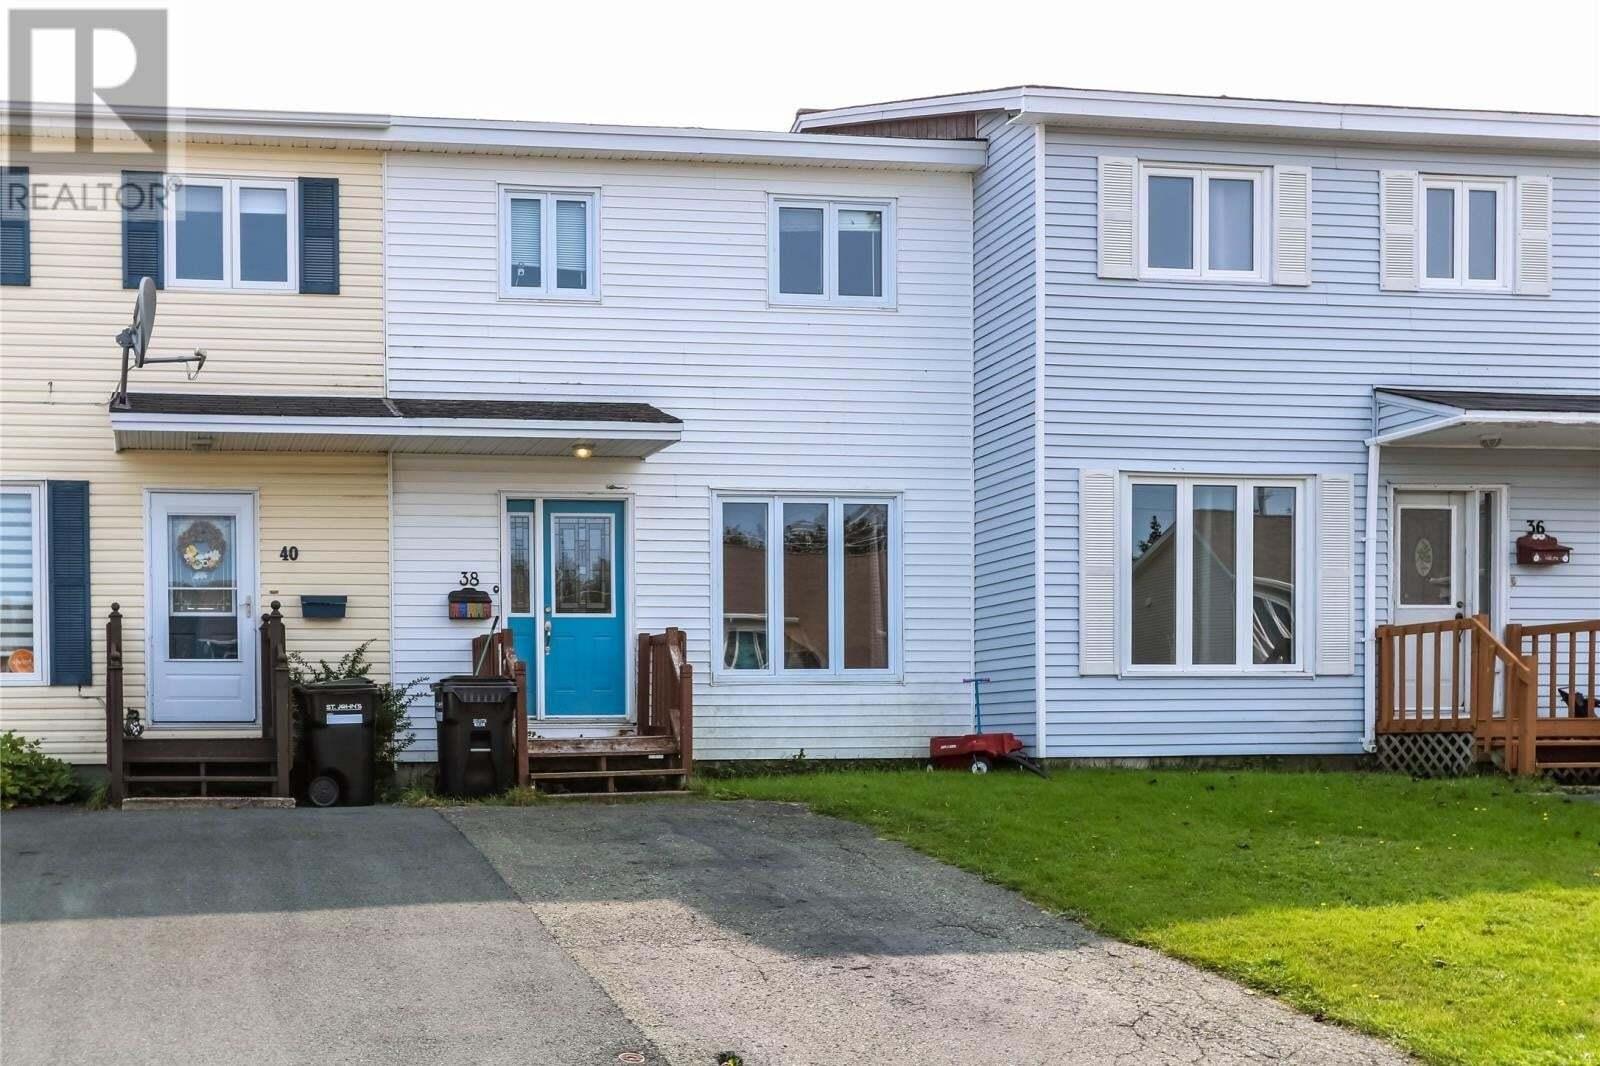 House for sale at 38 Prospero Pl St. John's Newfoundland - MLS: 1221471